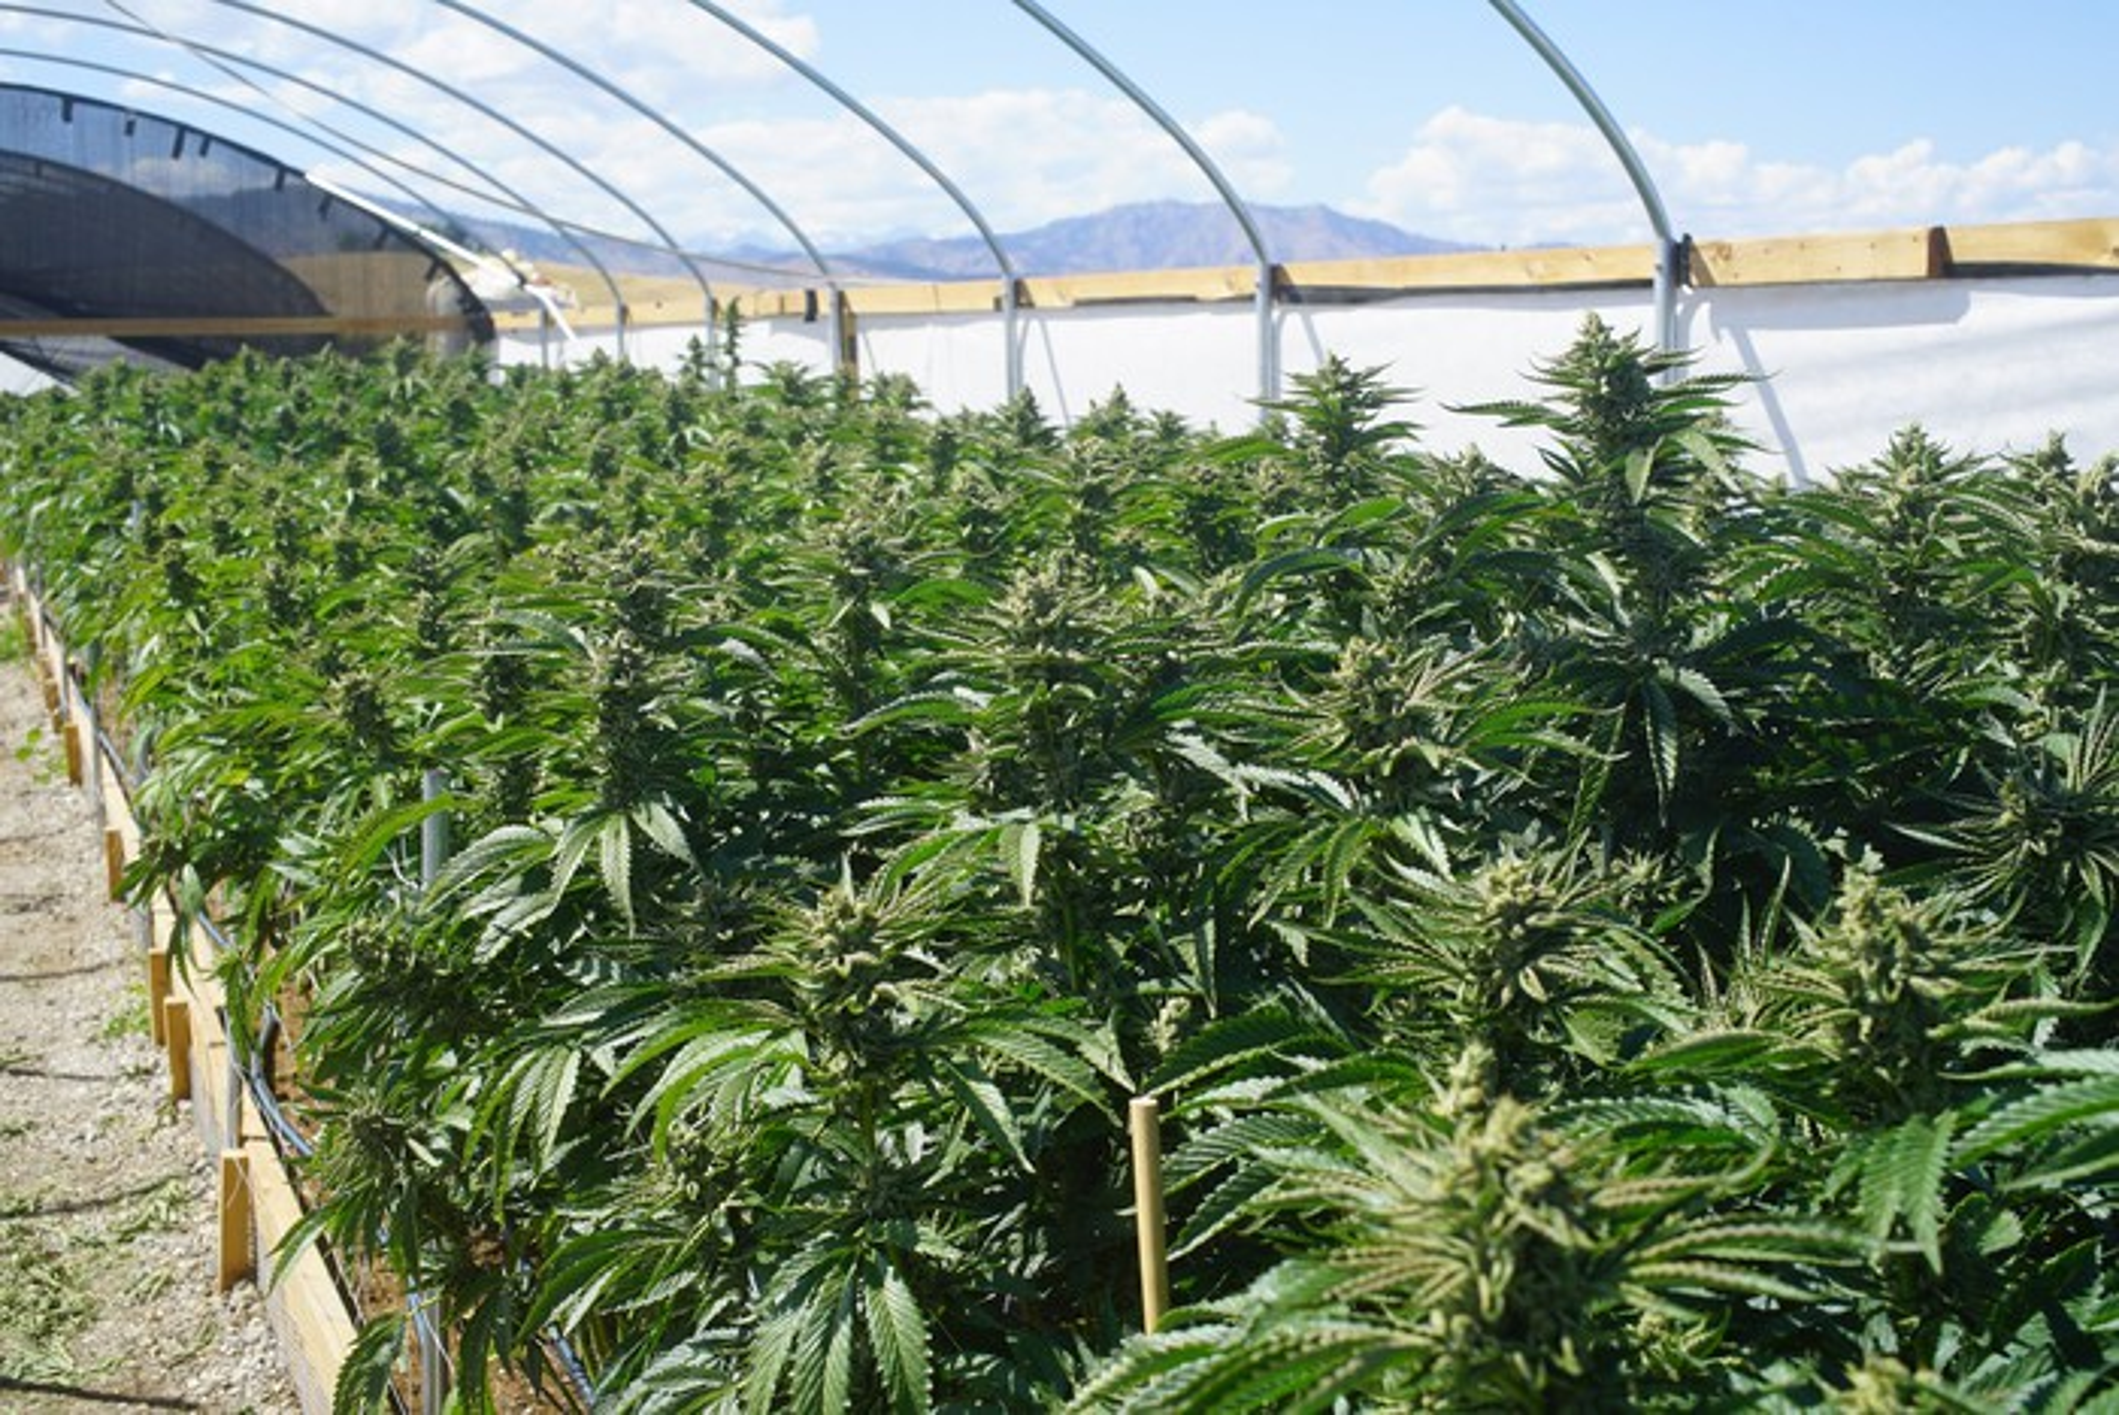 An outdoor cannabis greenhouse.